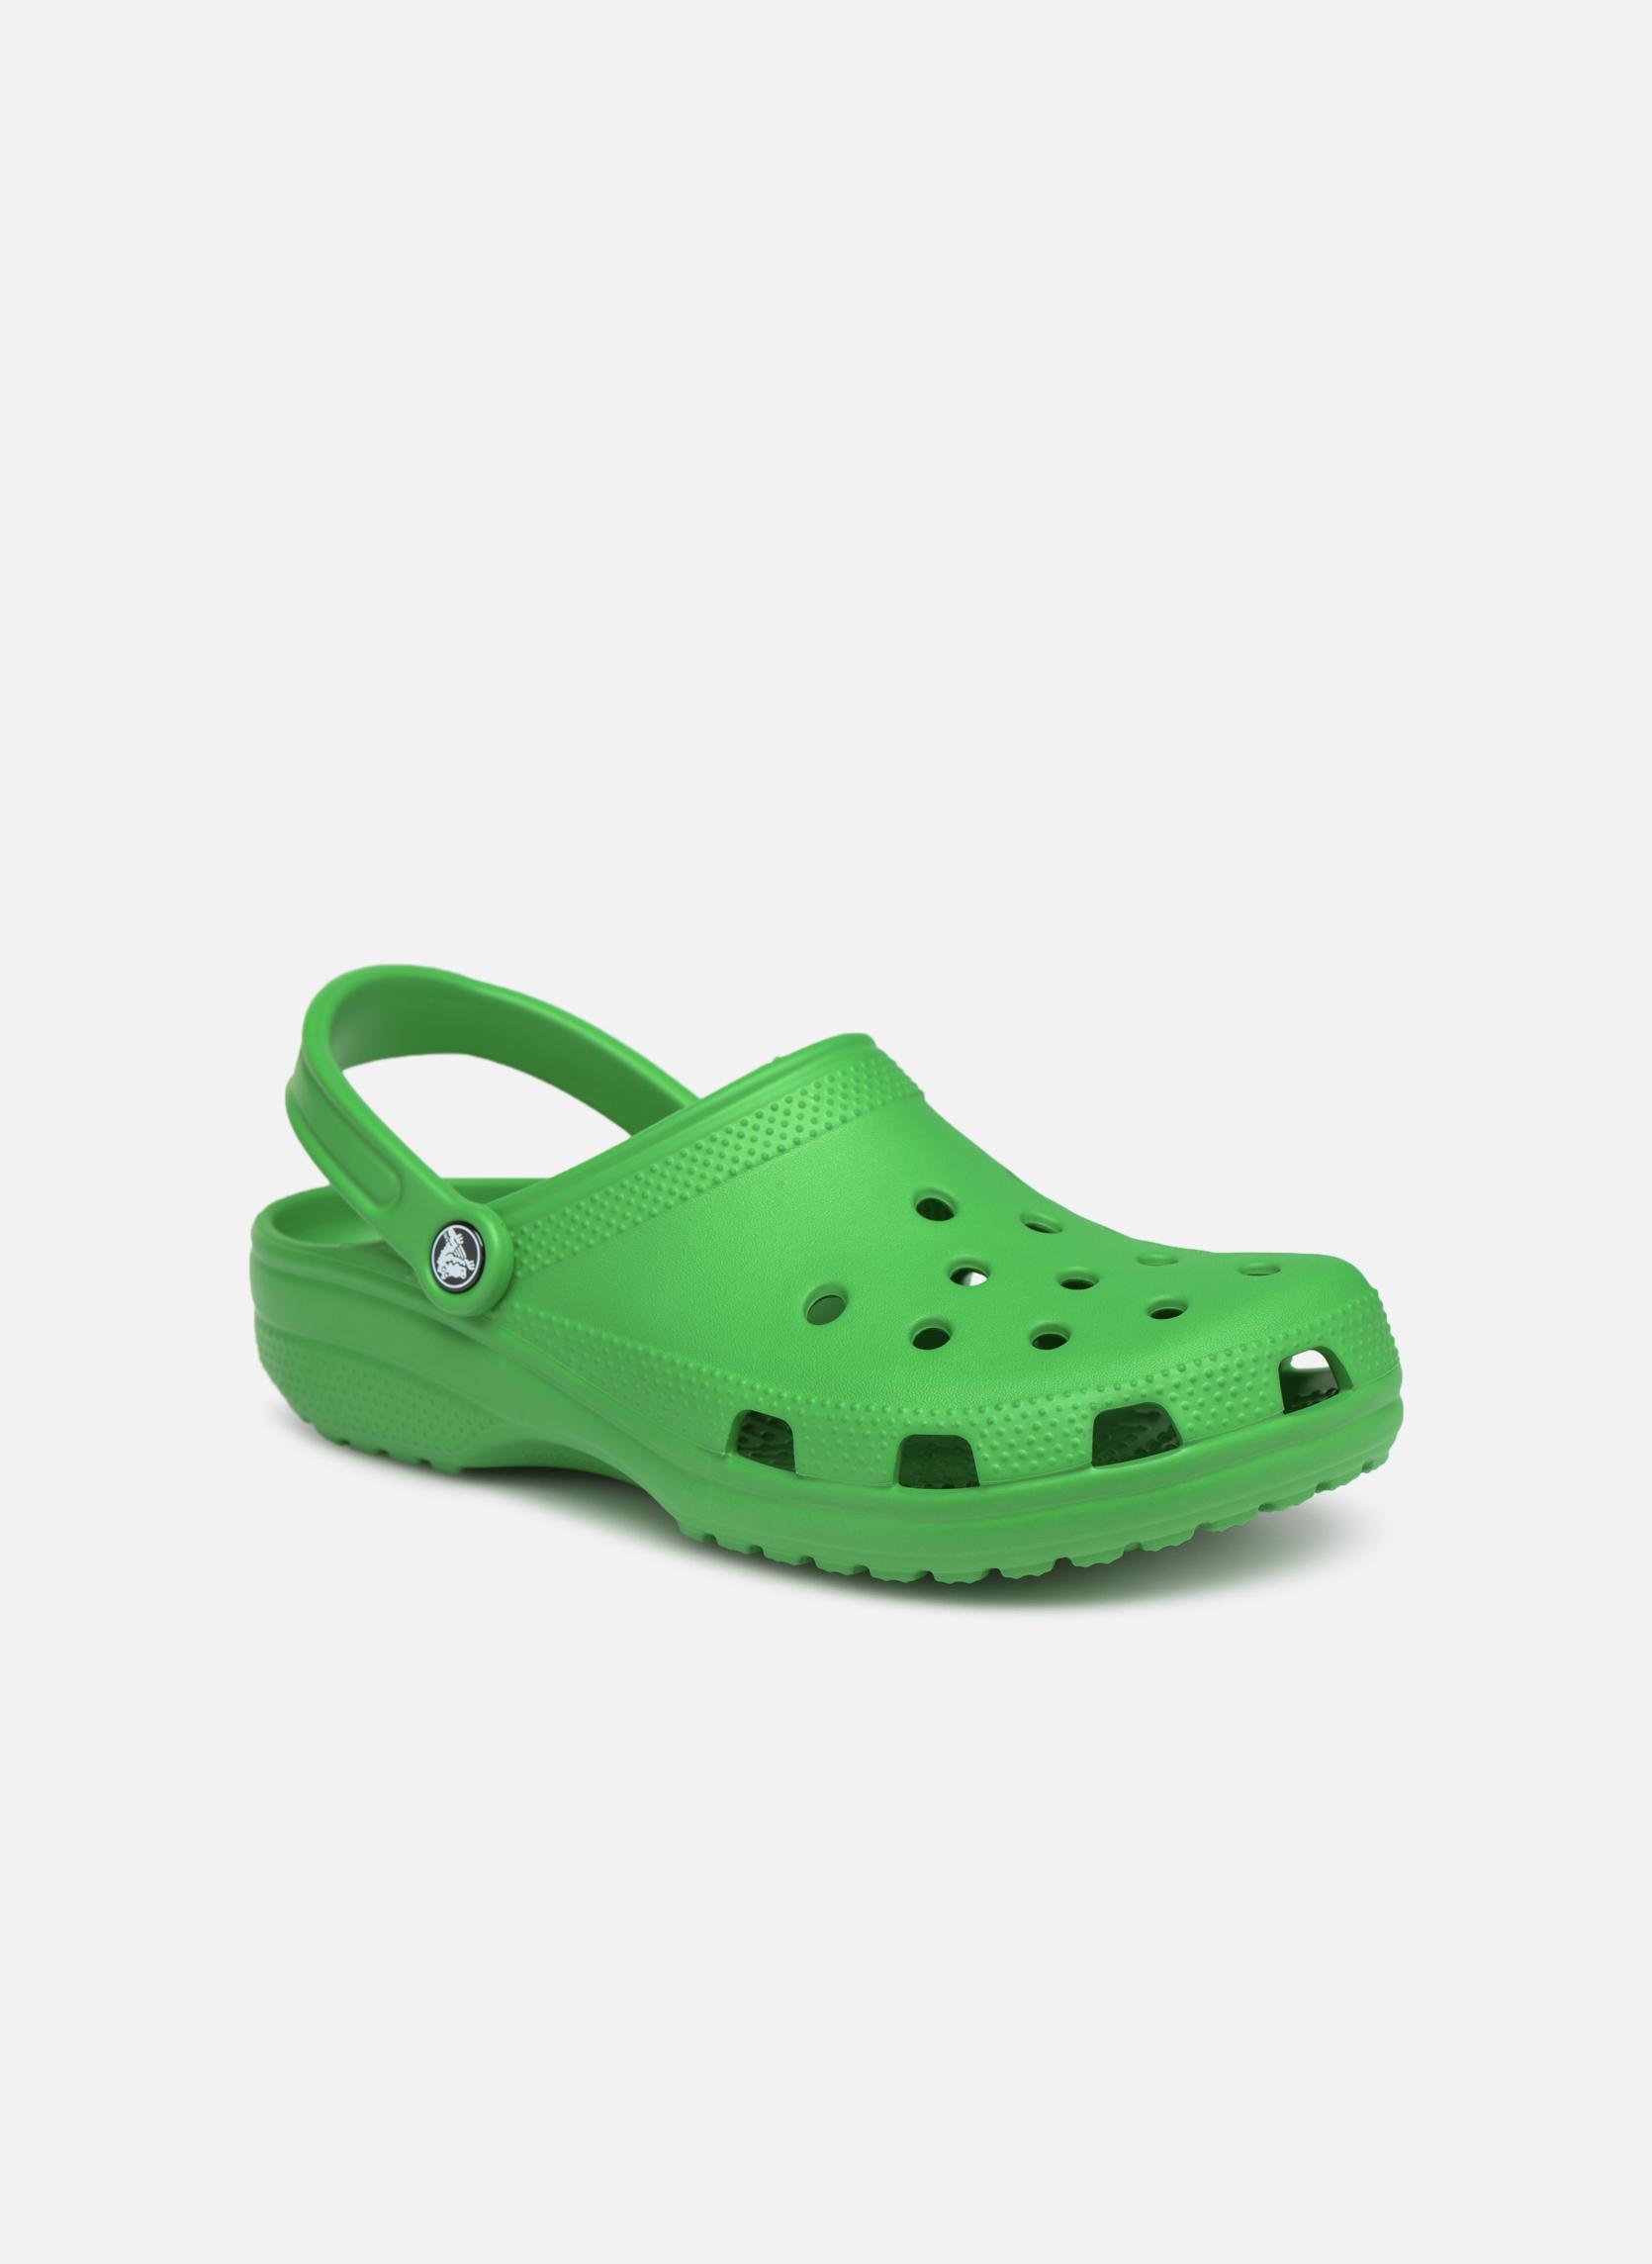 Crocs - Herren - Cayman H - Sandalen - grün LbxDHeBPx